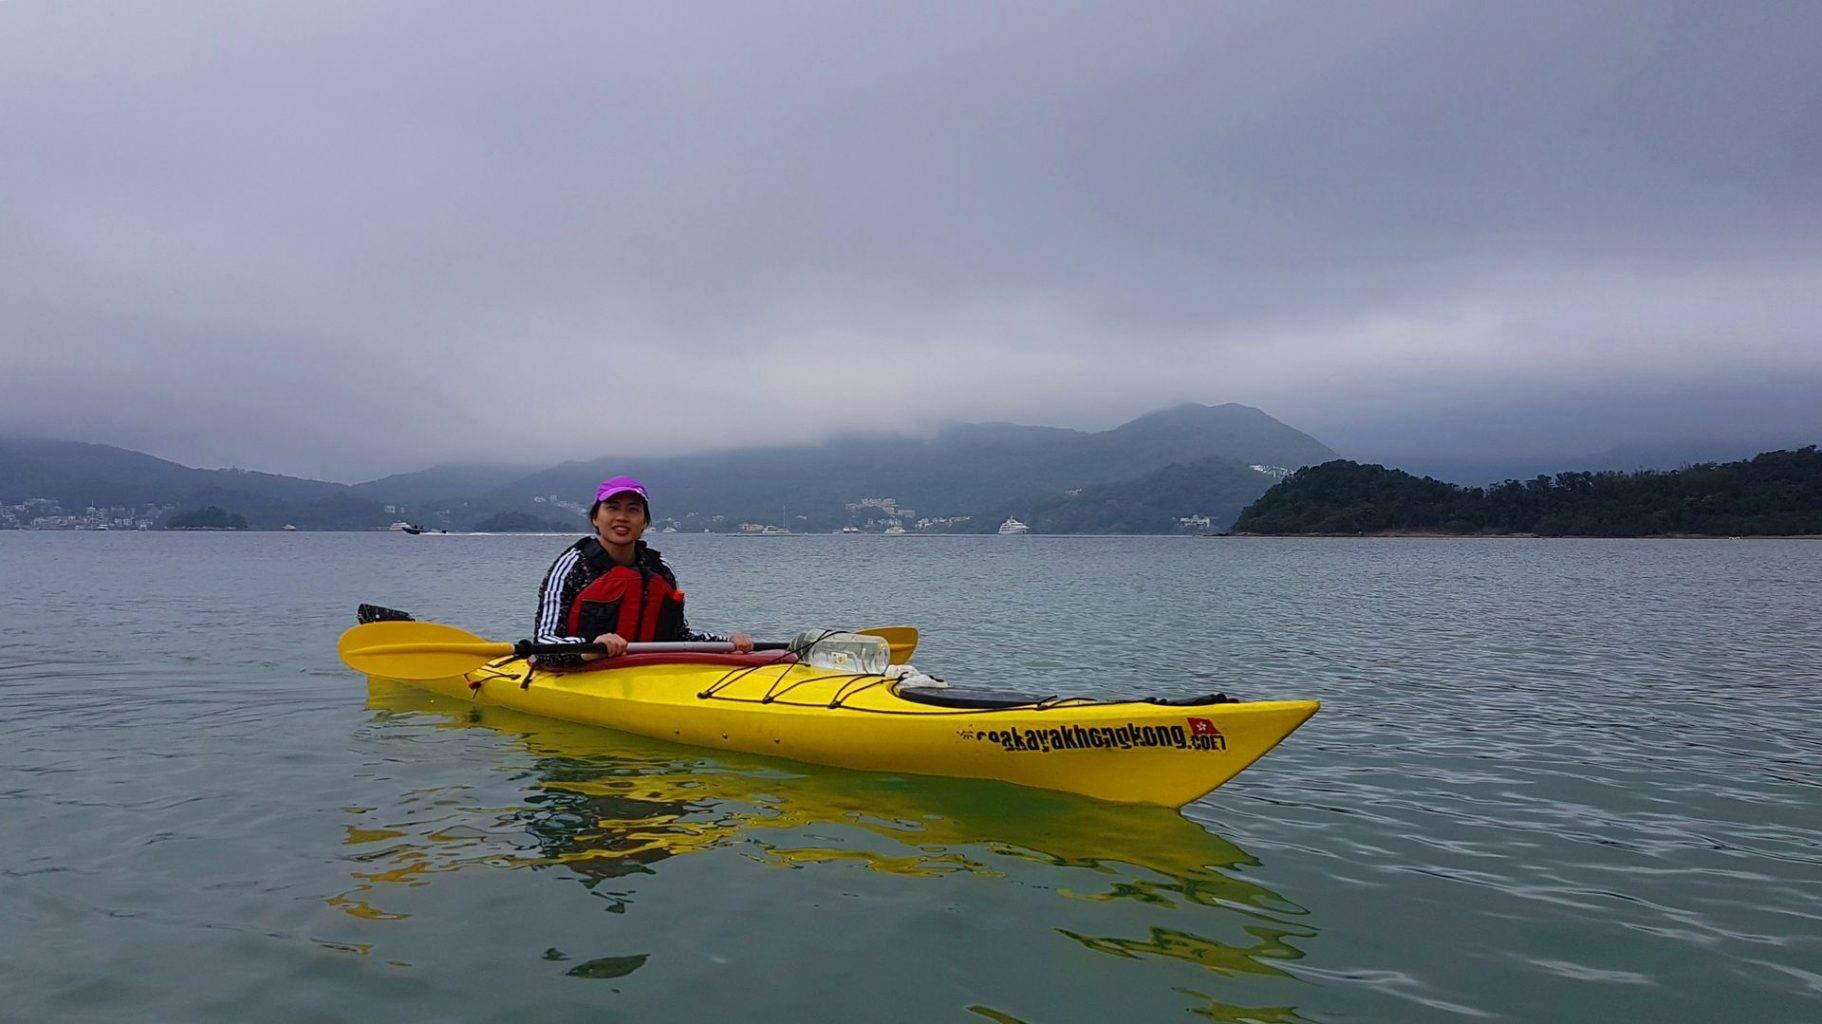 21 Feb 2019 Sea Kayak Hong Kong UNESCO Geopark 06